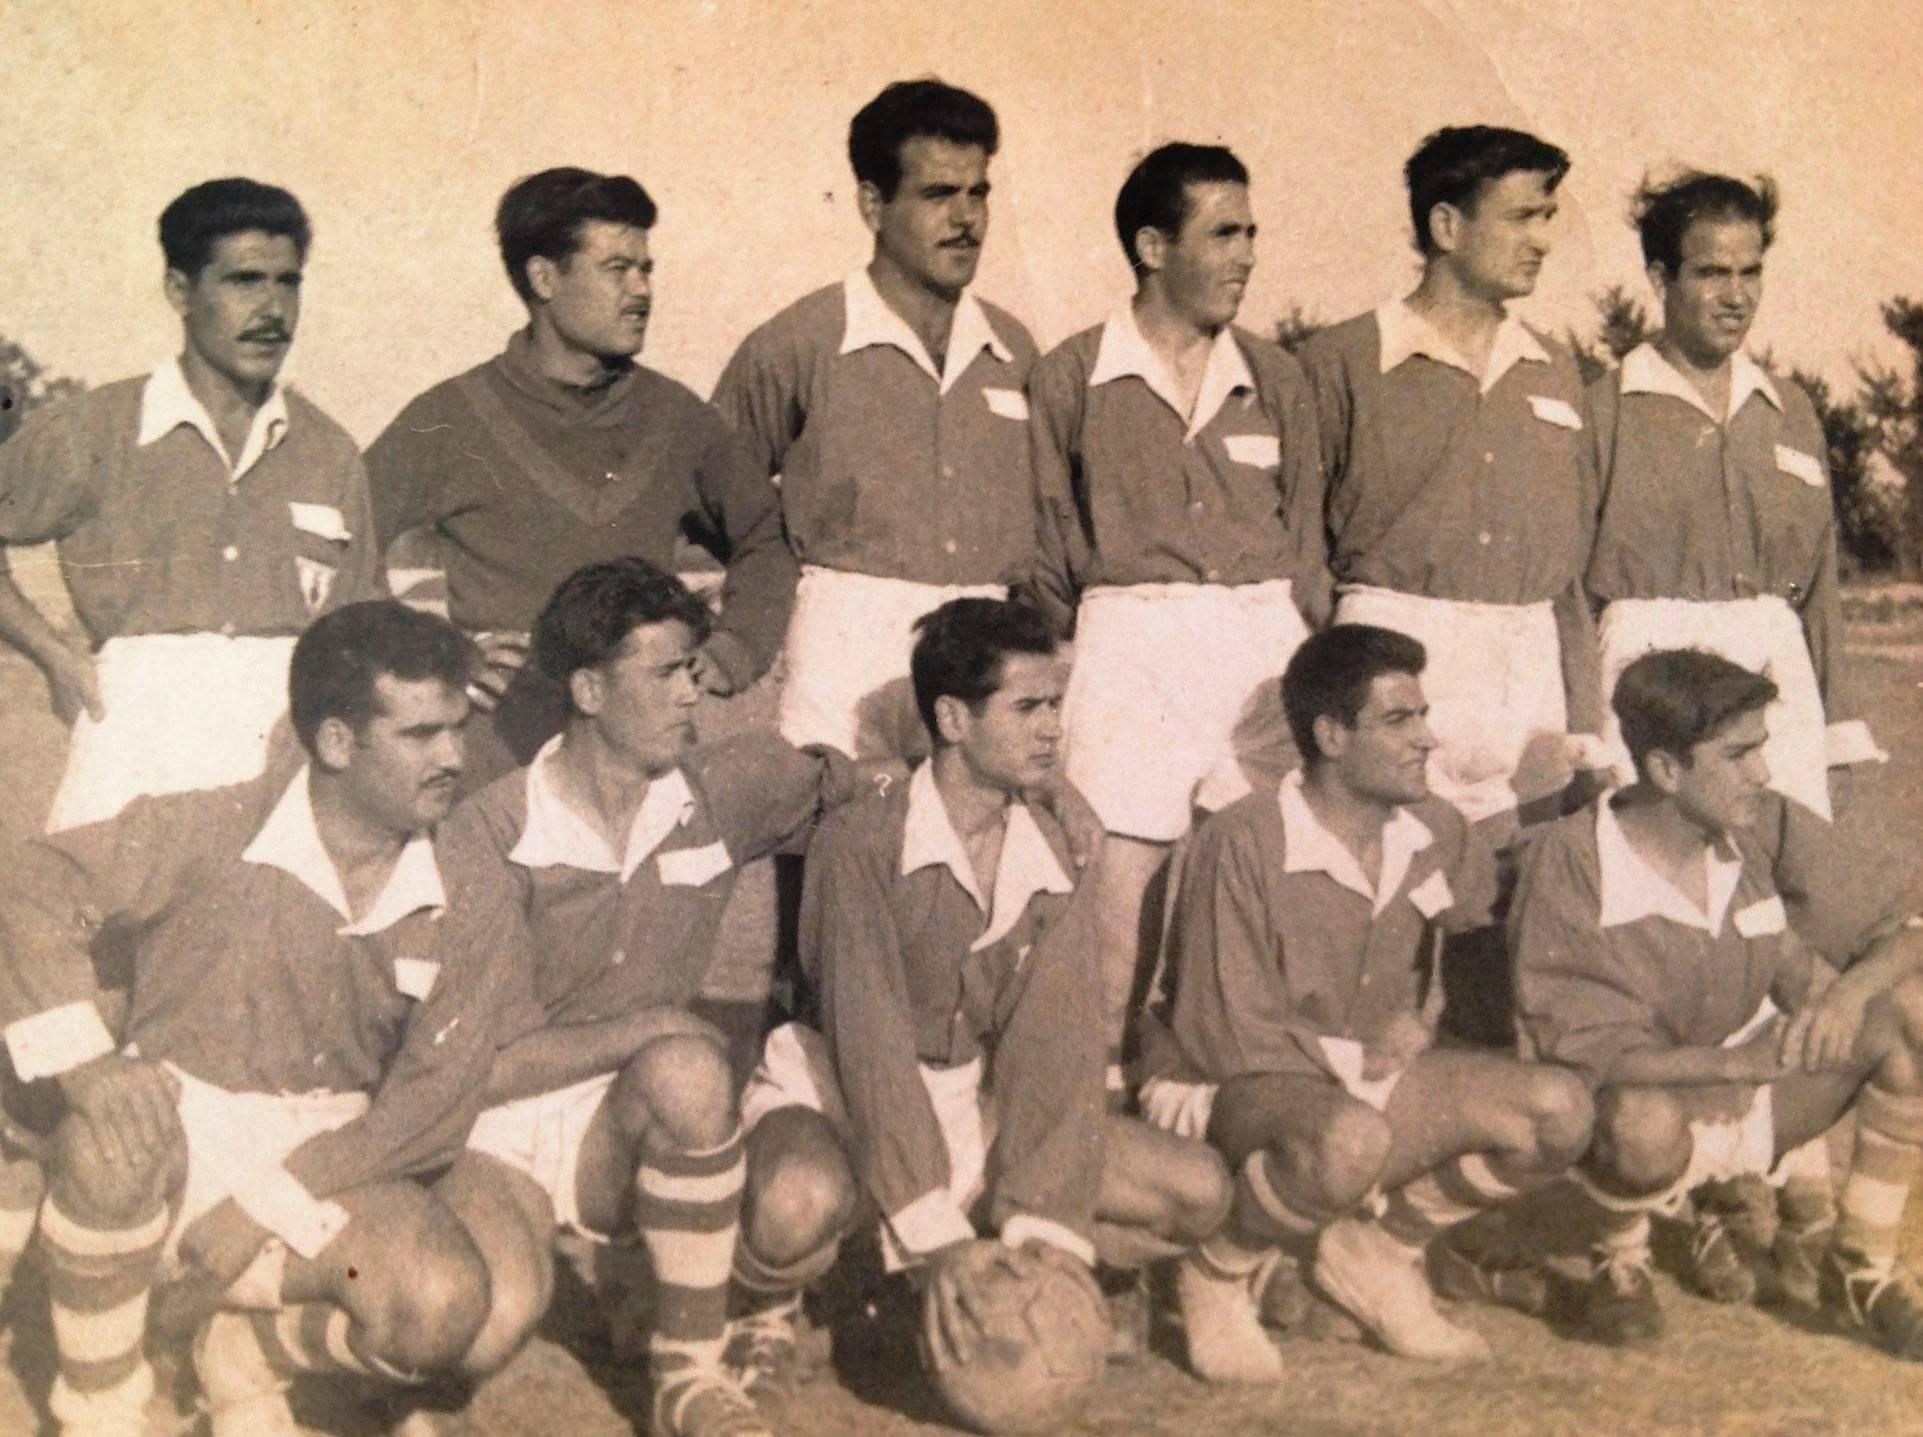 equipo-herencia-3o-division